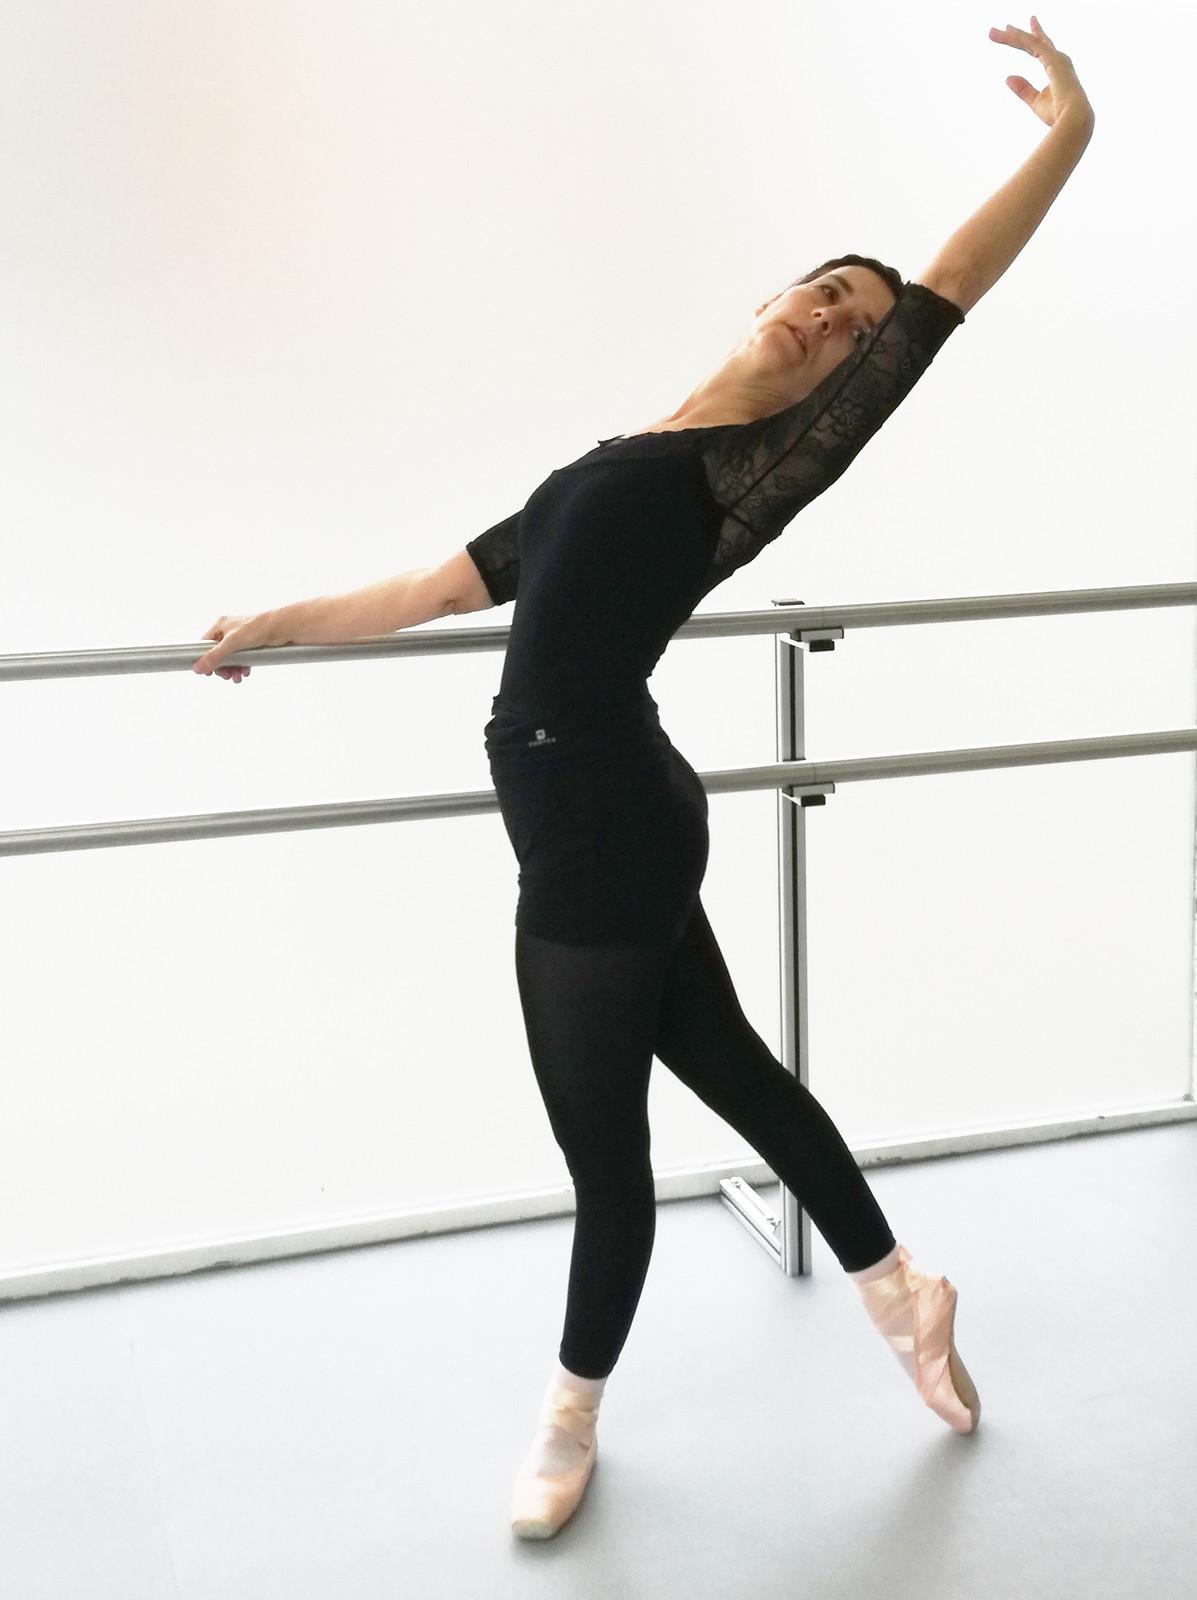 kinderballett b blingen sindelfingen akzentanz ballett modern dance. Black Bedroom Furniture Sets. Home Design Ideas